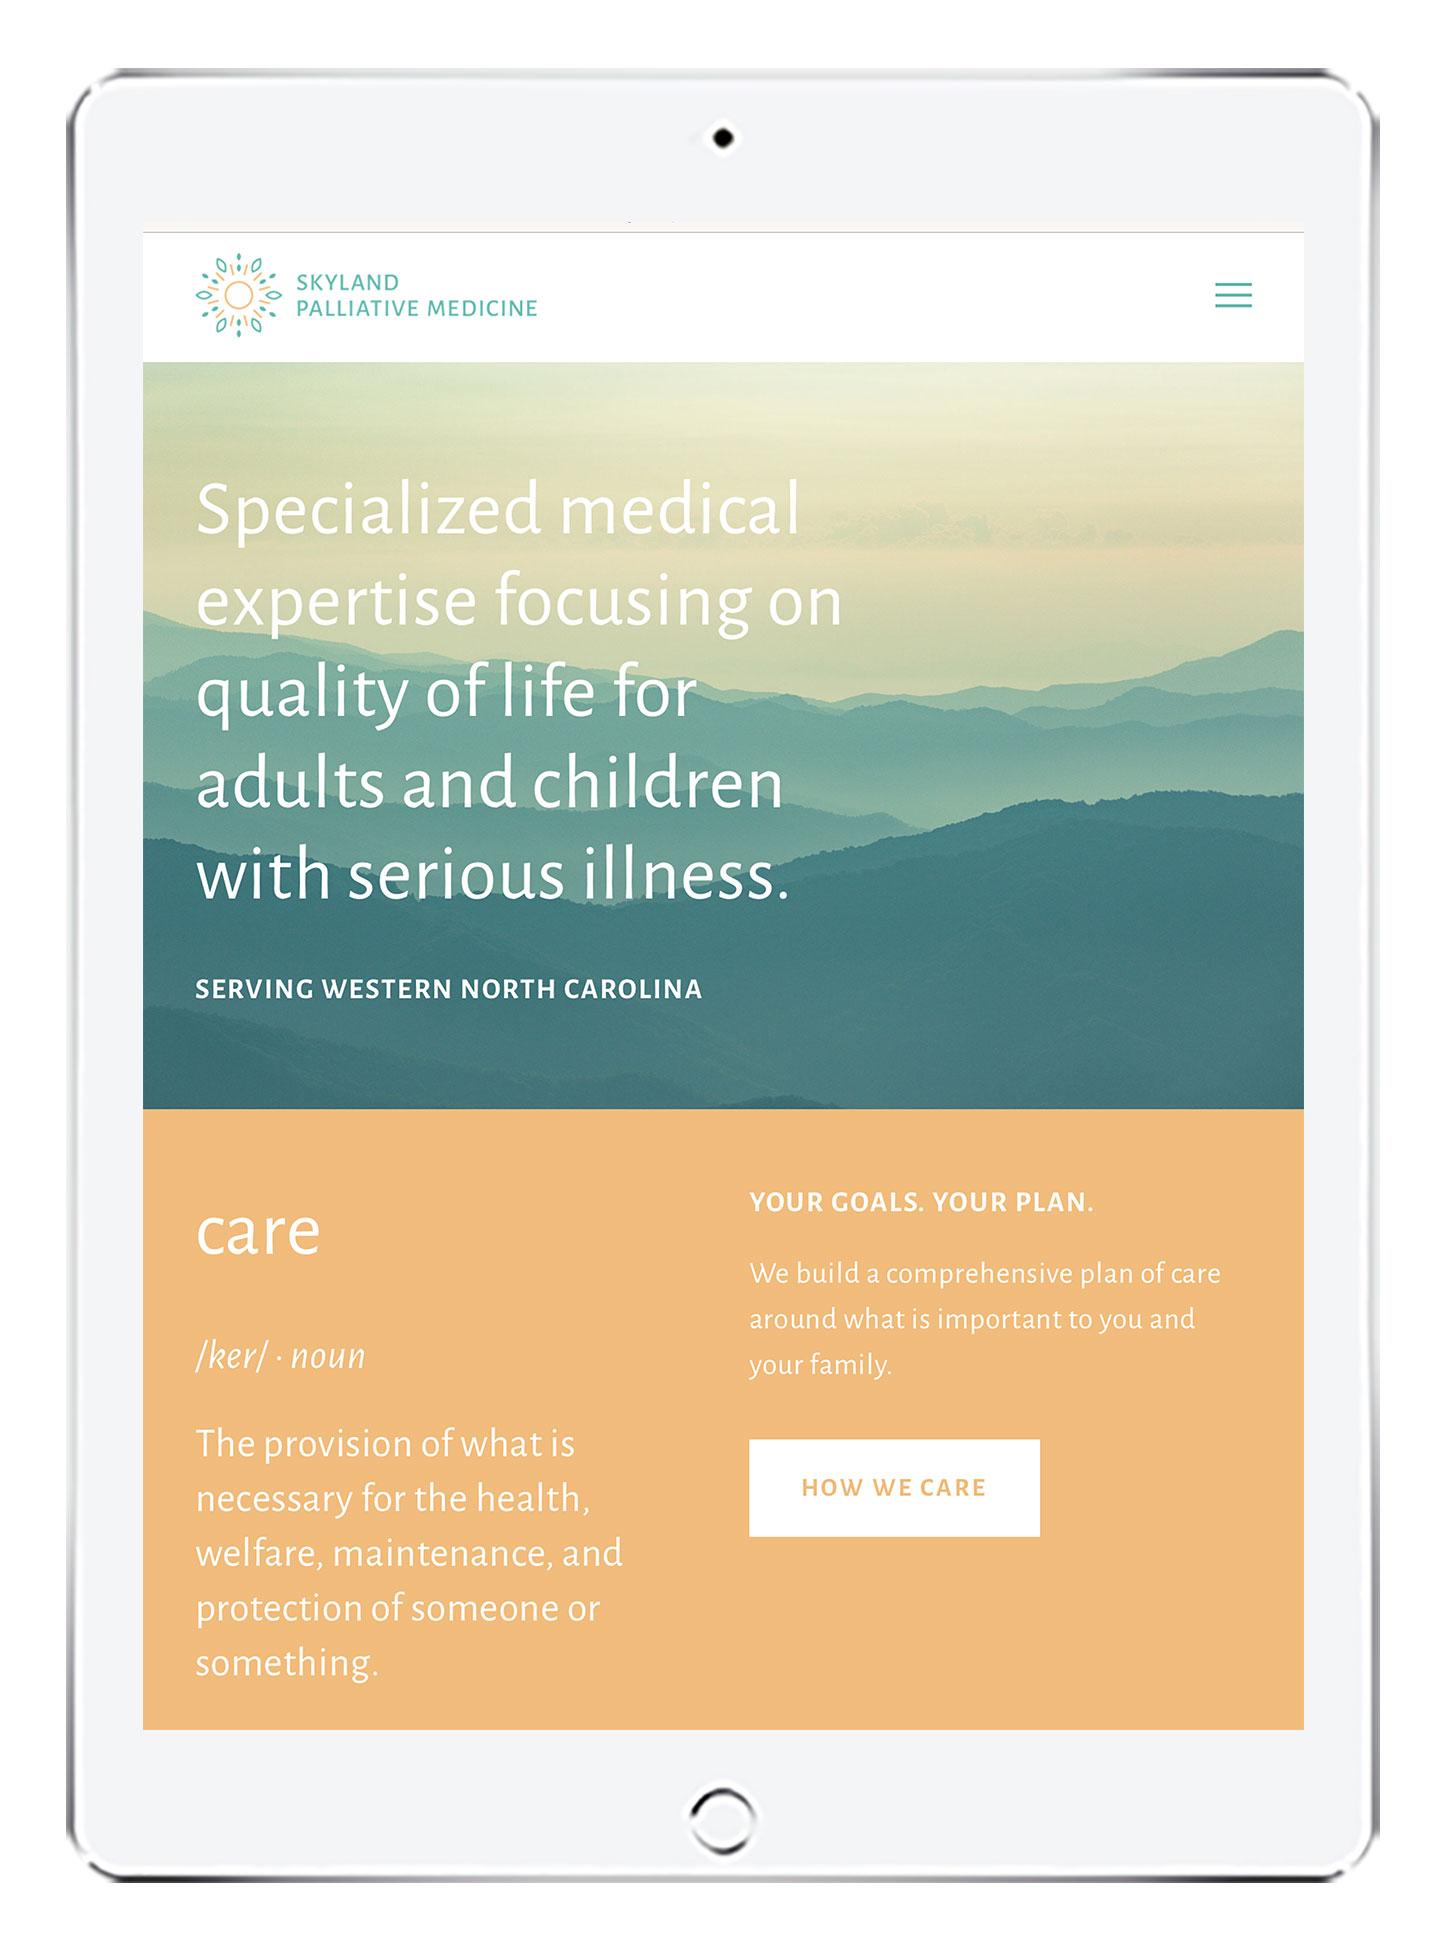 skyland-palliative-medicine-website-ipad-1.jpg